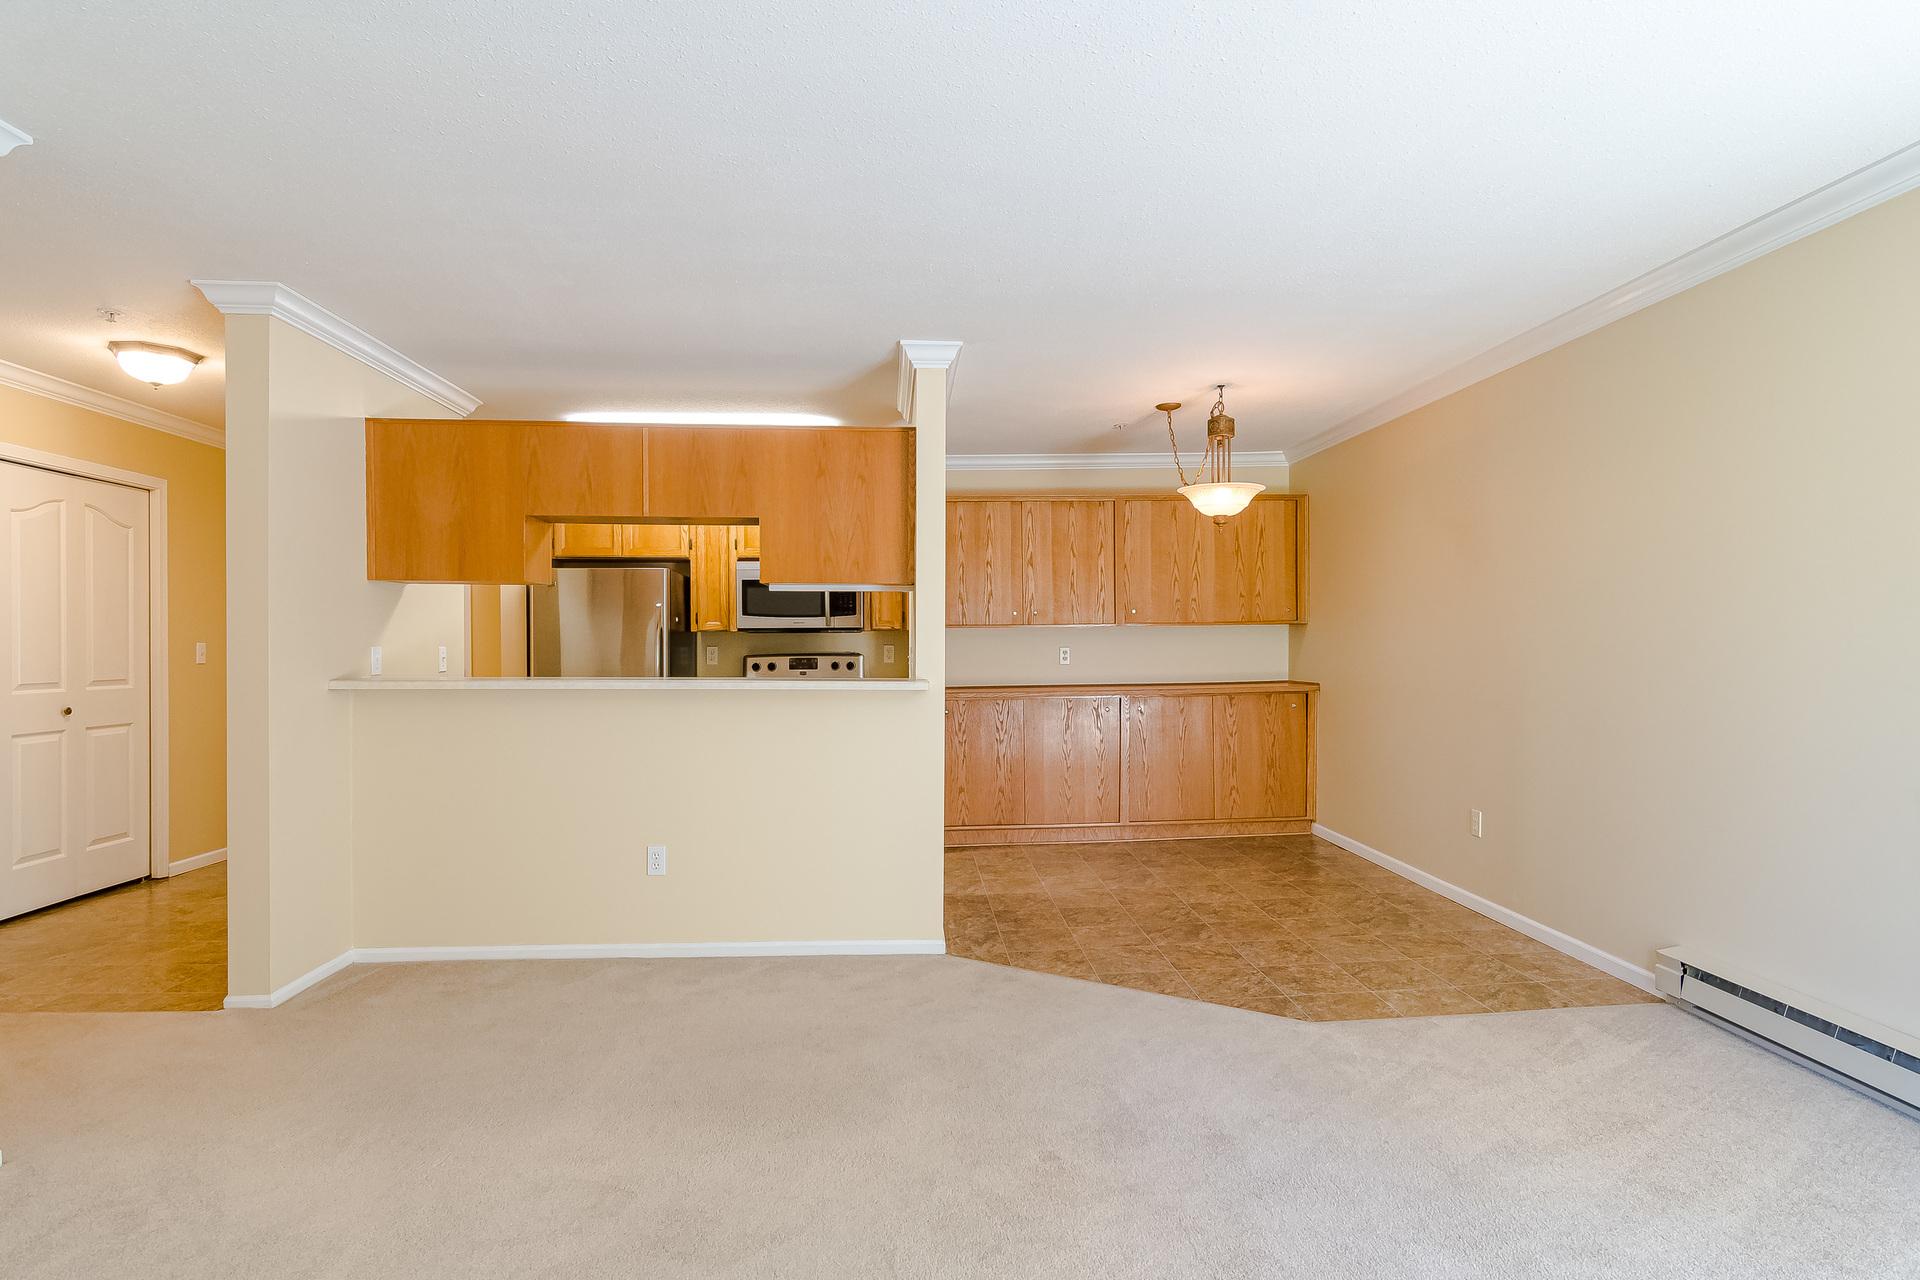 Foyer, Kitchen & Dining Room  at 219 - 2239 152 Street, Sunnyside Park Surrey, South Surrey White Rock